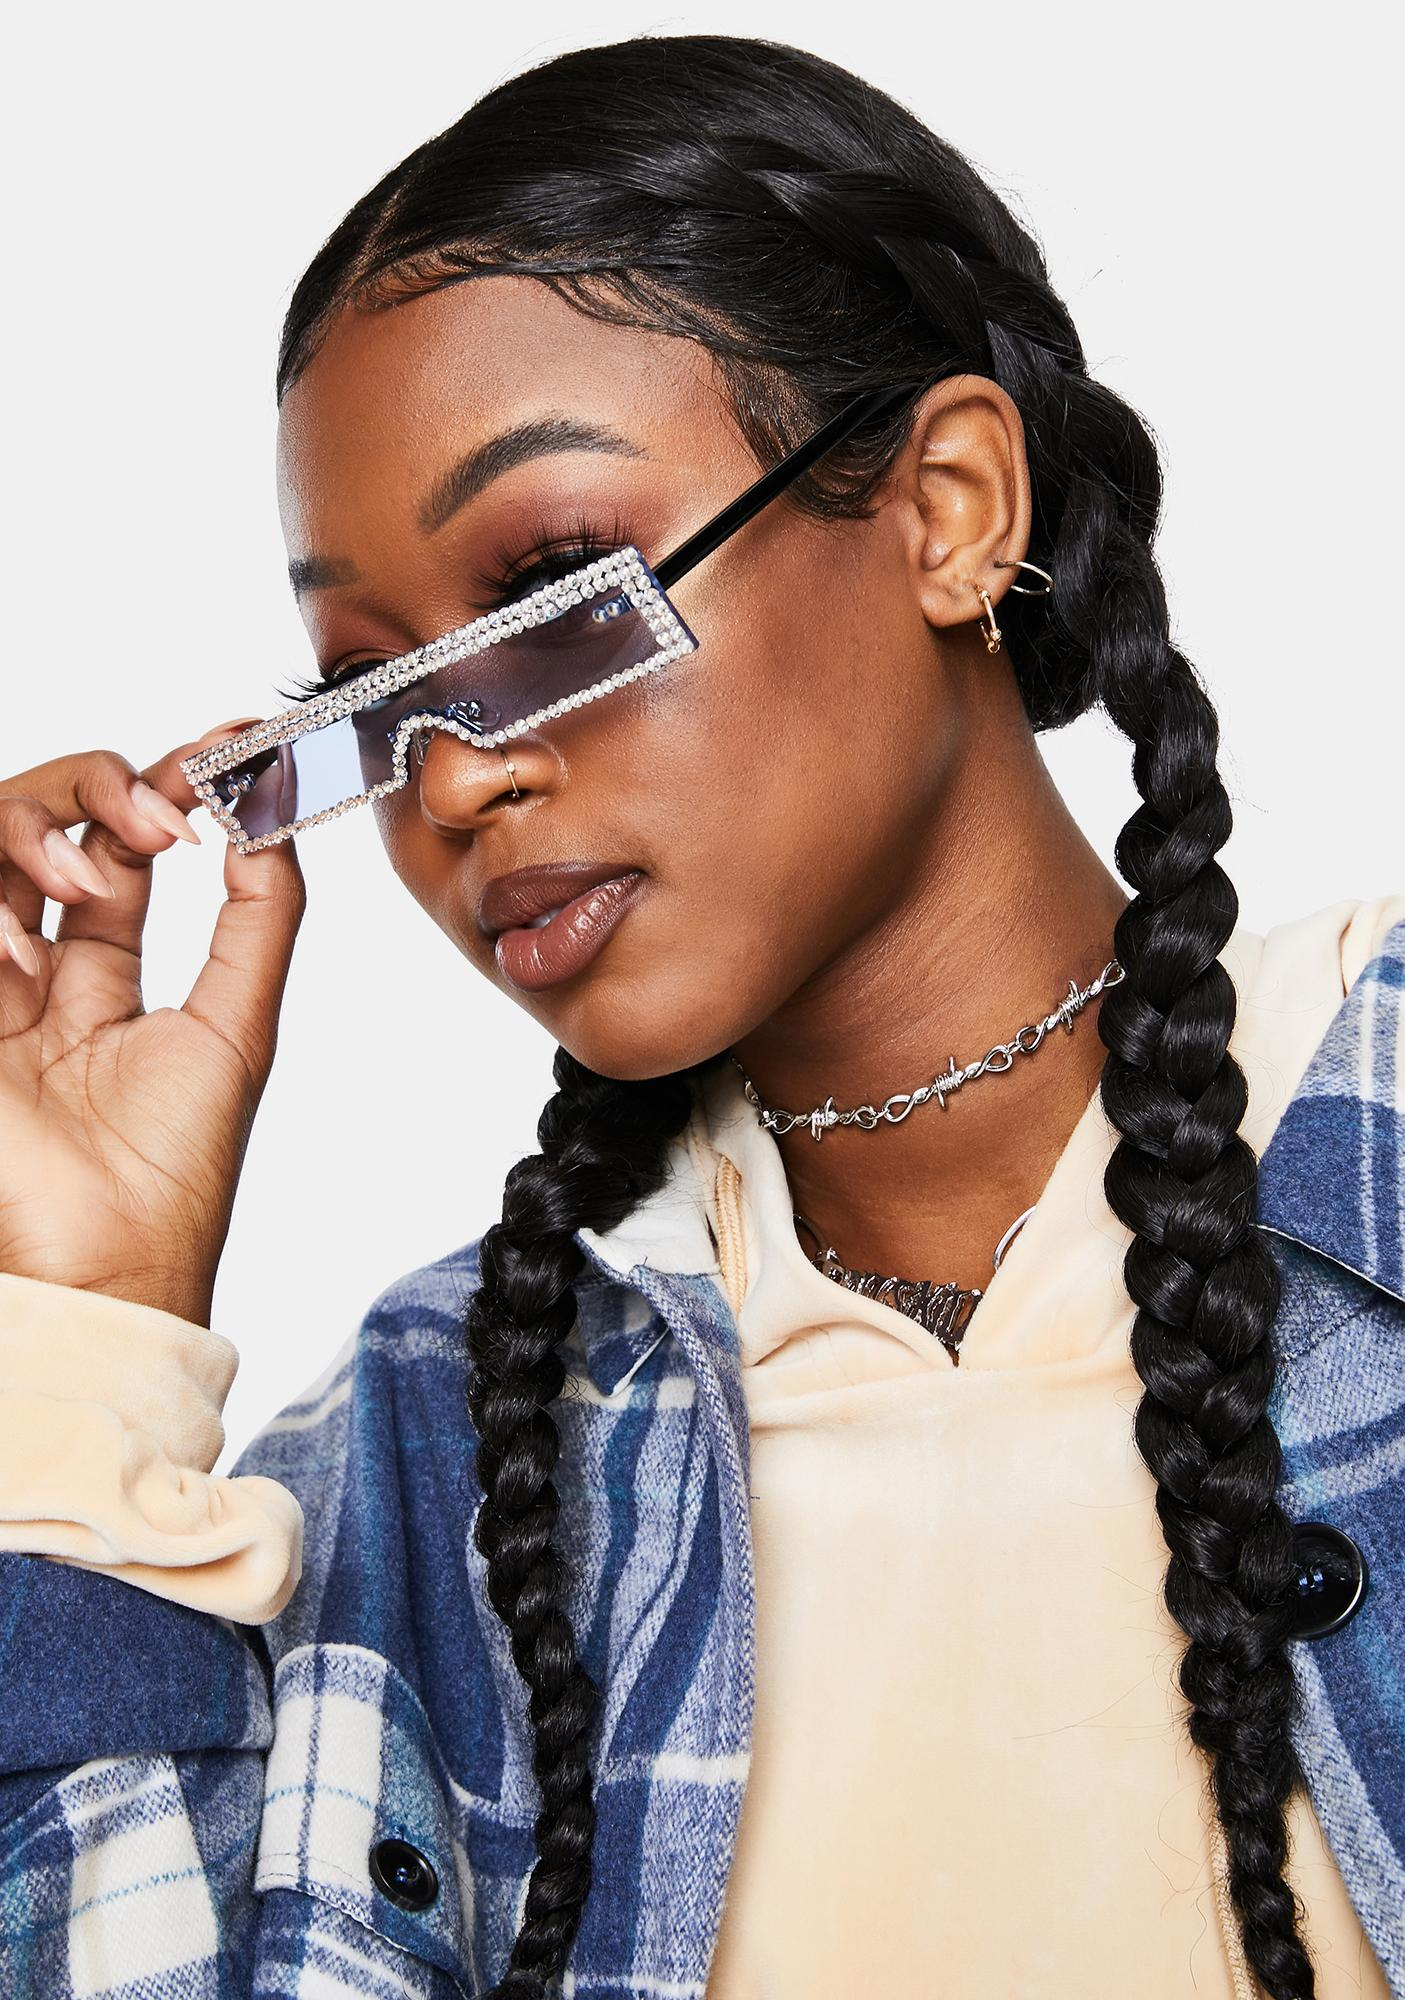 Sky Into The Future Slim Rhinestone Sunglasses